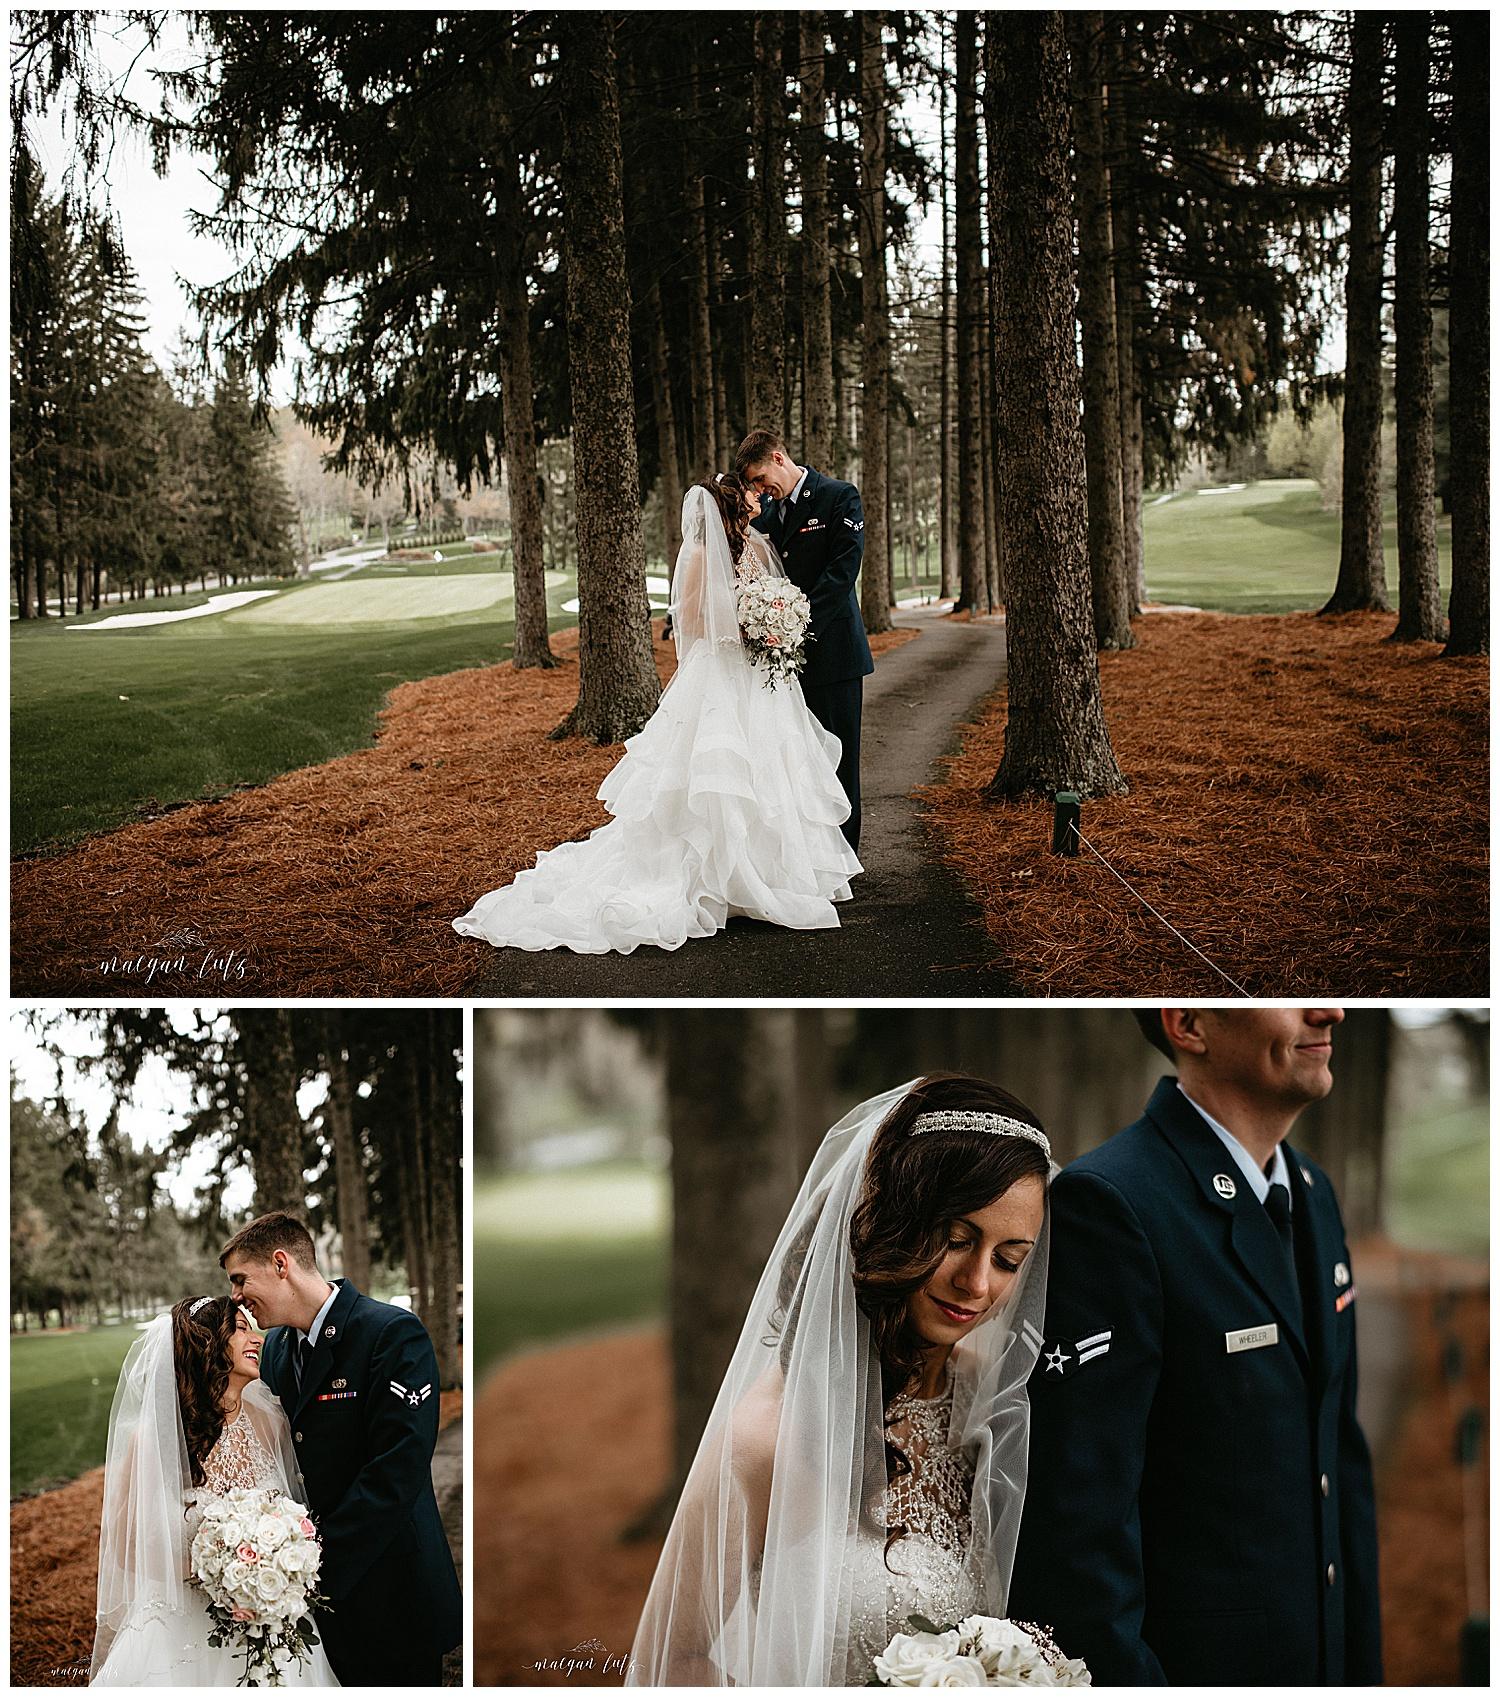 NEPA-Lehigh-Valley-Wedding-Photographer-at-Glen-Oak-Country-Club-Clarks-Summit-PA_0023.jpg